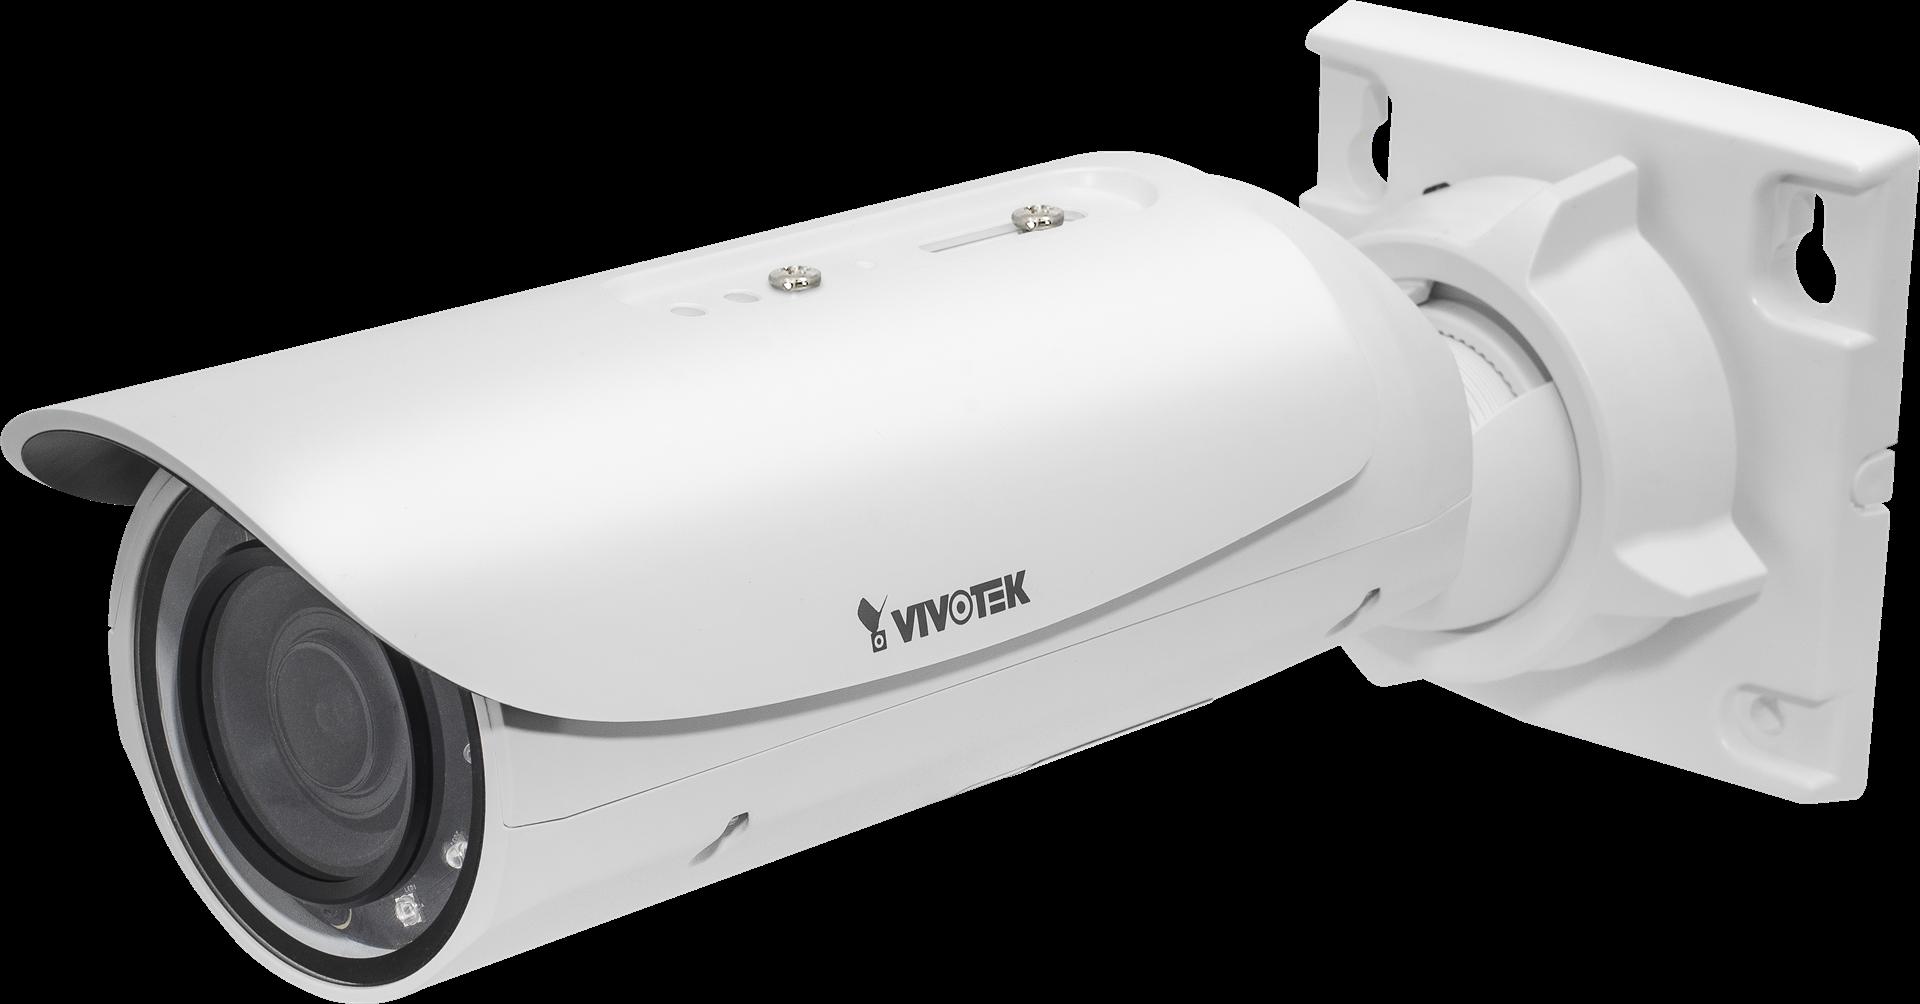 Vivotek IB8367 - Bullet Network Camera - 2MP